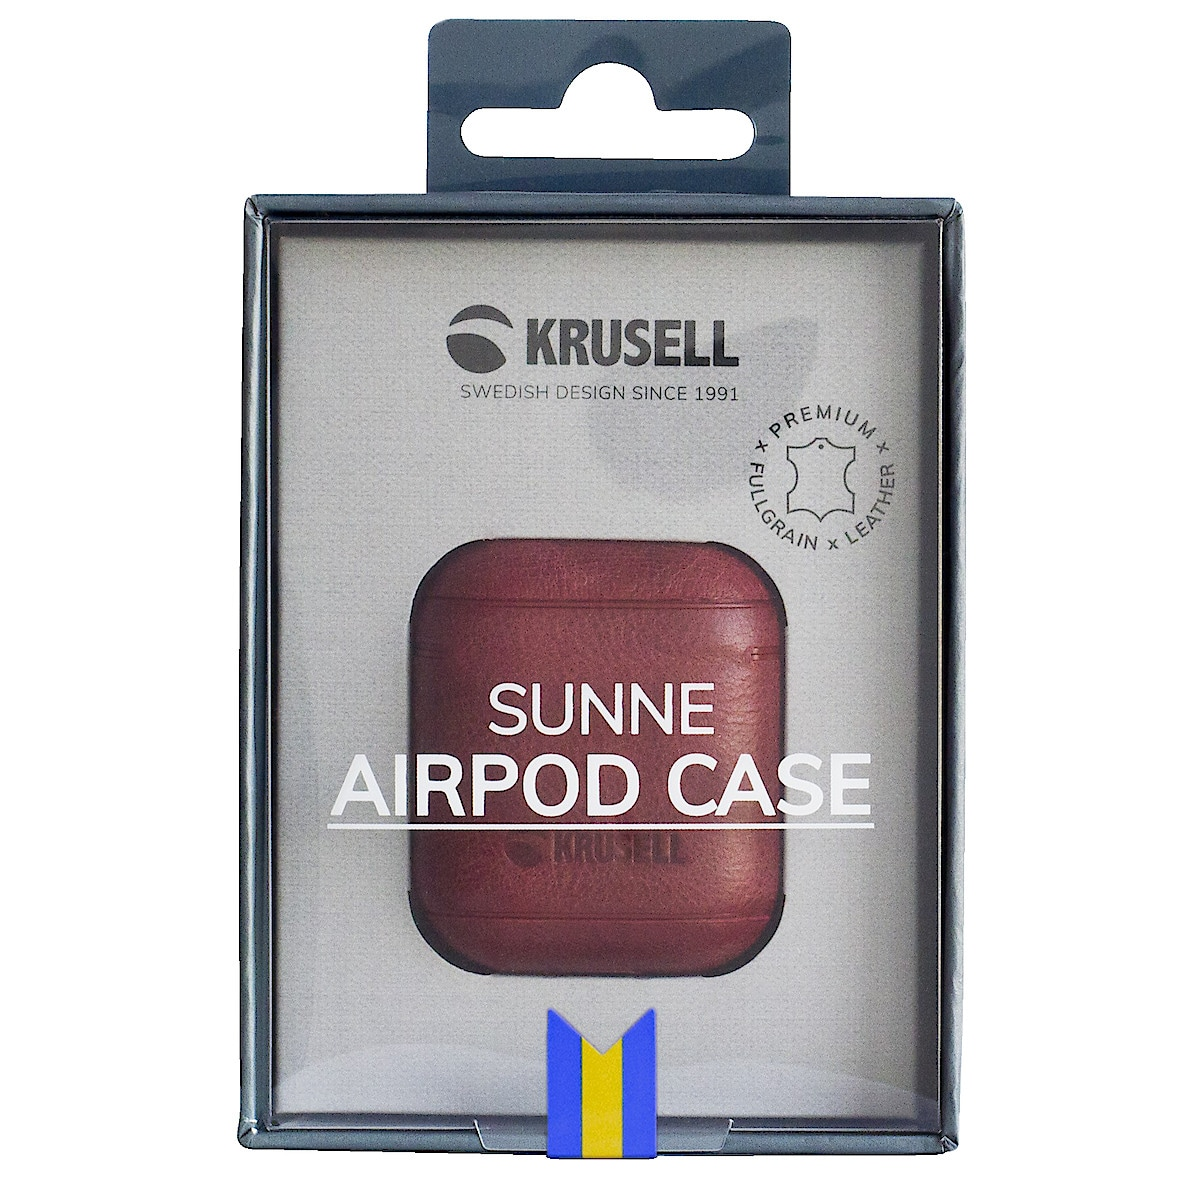 Fodral för AirPods, Krusell Sunne